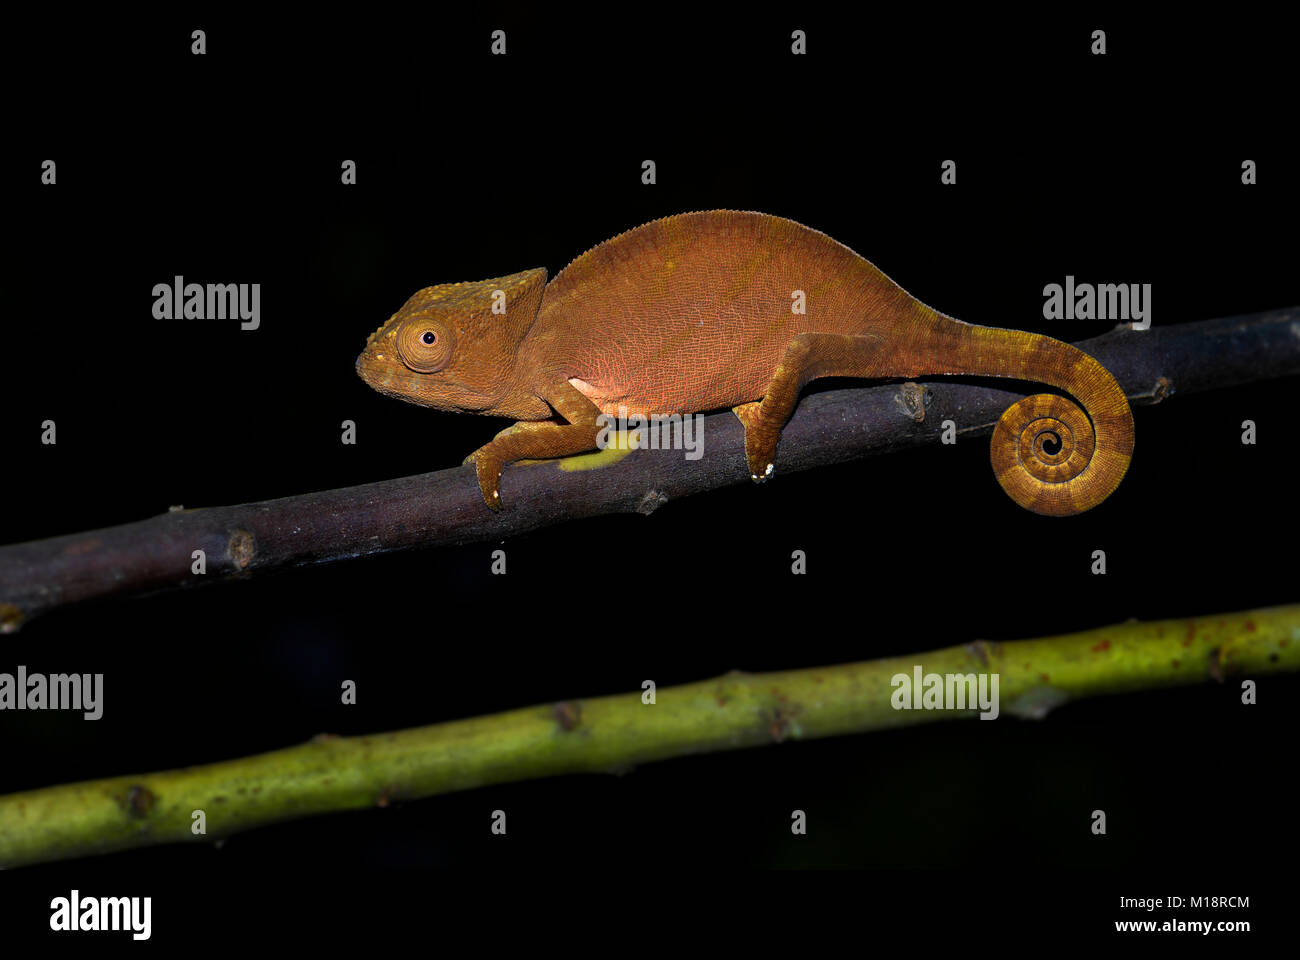 Short-horned Chameleon - Calumma brevicorne, Madagascar rain forest. Beautiful coloured lizard. Elephant ear. - Stock Image